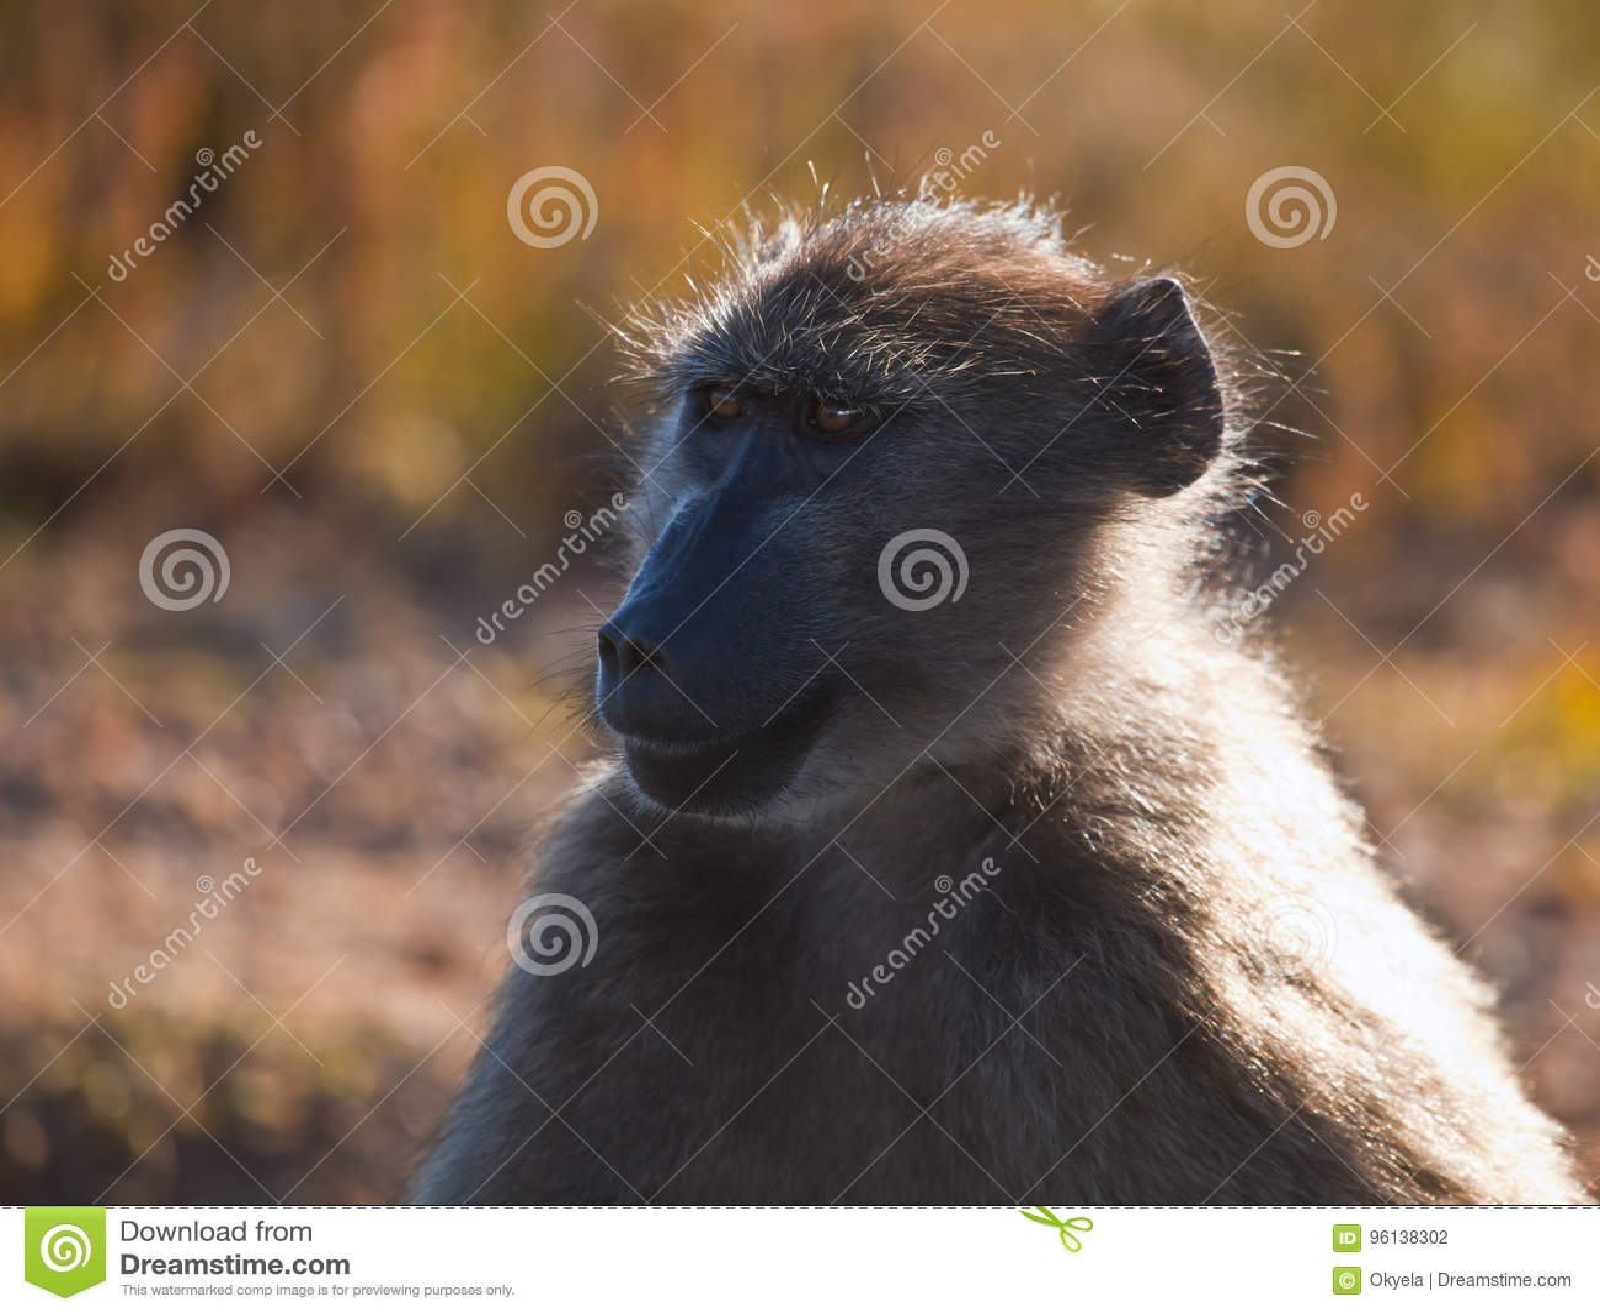 Adult female baboon looks away.